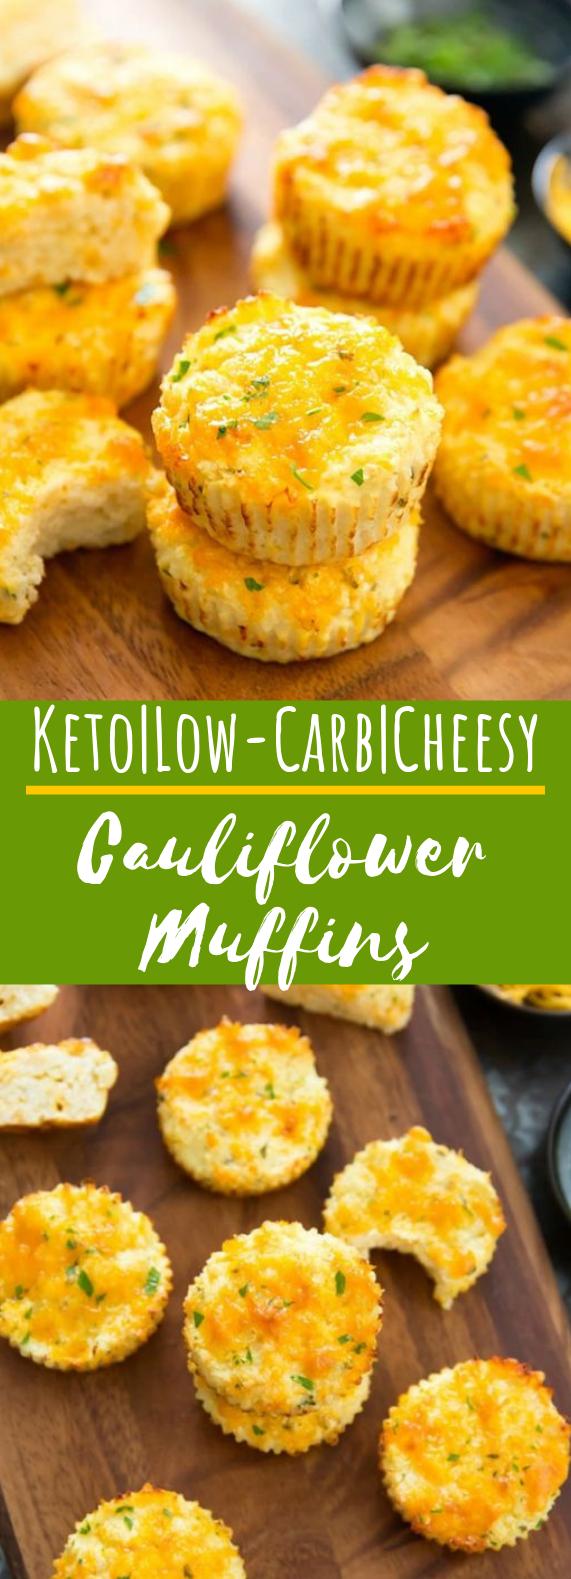 Cauliflower Muffins #appetizers #keto